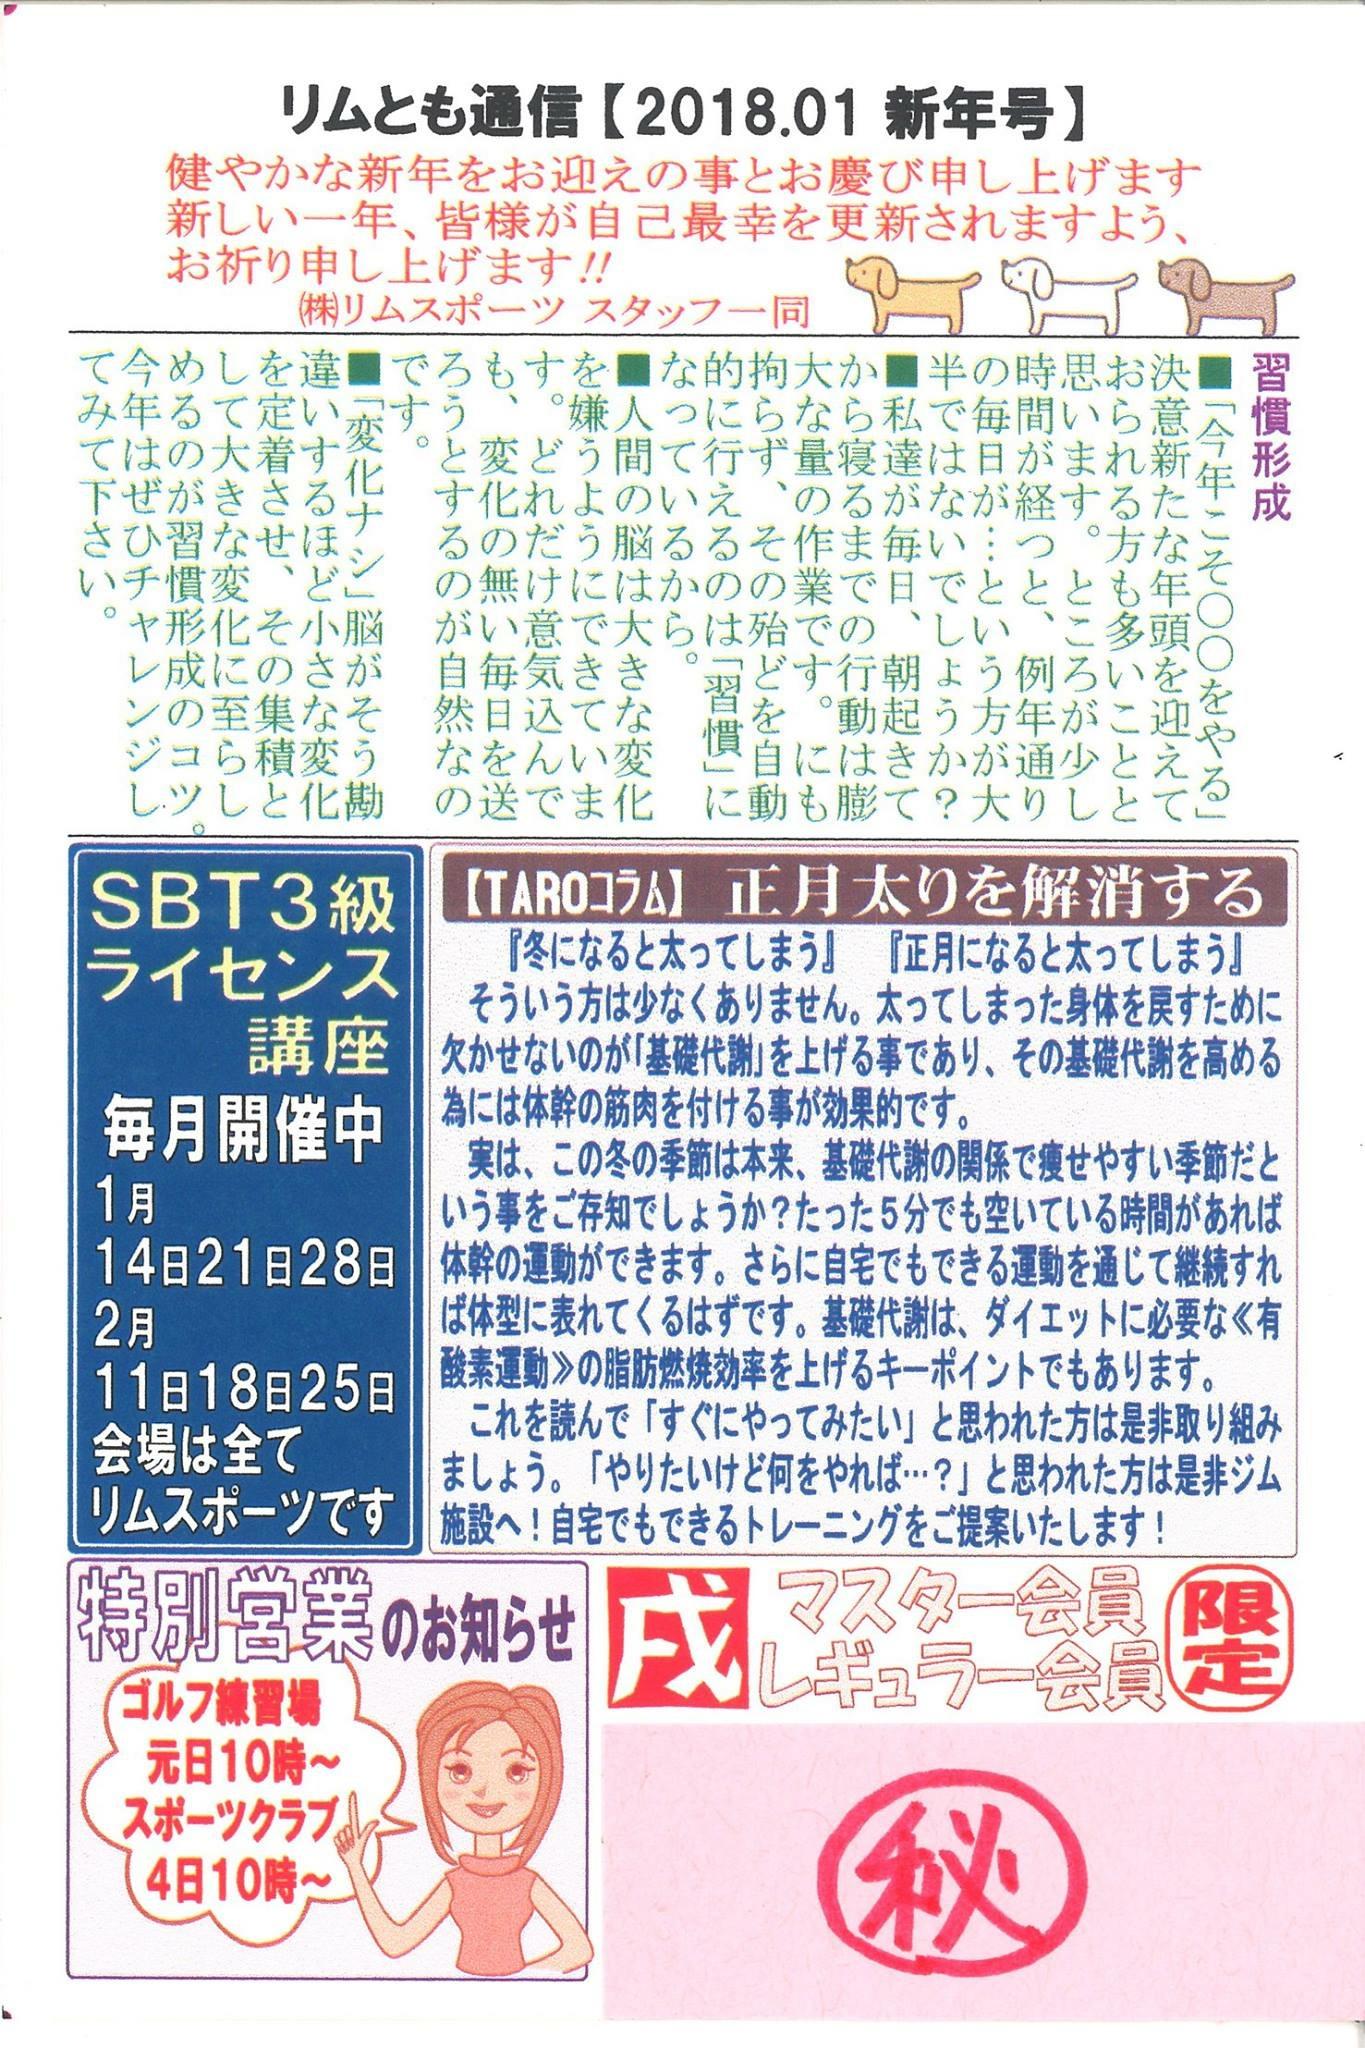 43D9775F-A310-4522-BA53-EEB5F0E31889.jpeg